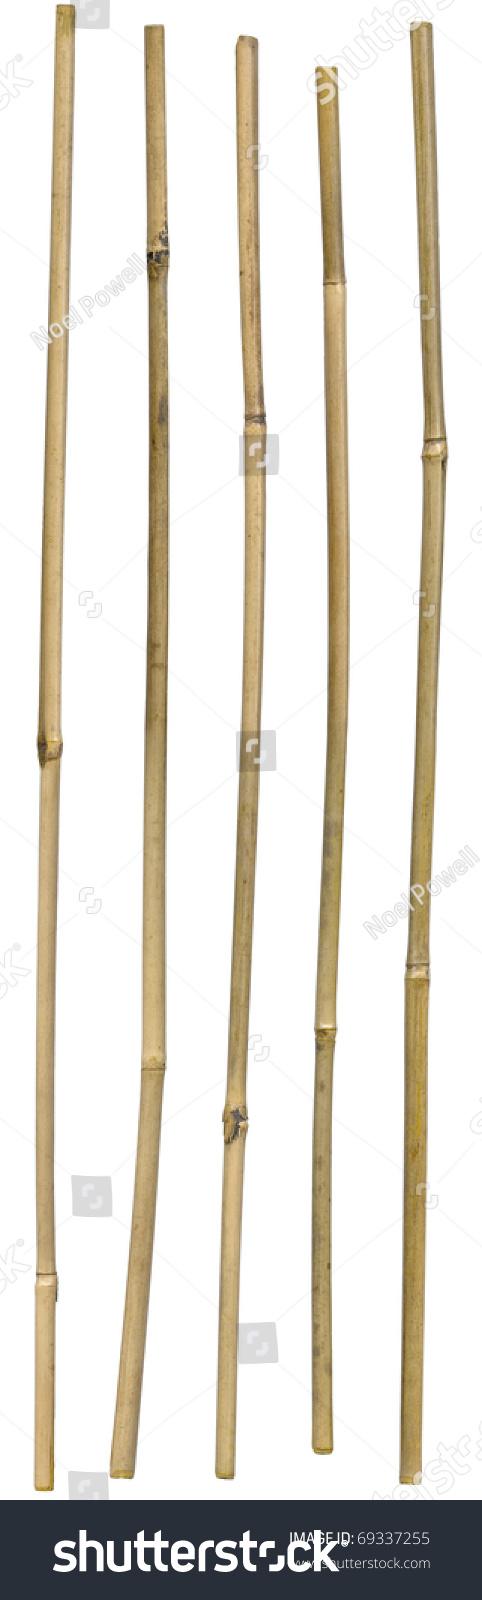 Five Dried Ornamental Bamboo Sticks Very Stock Photo ...